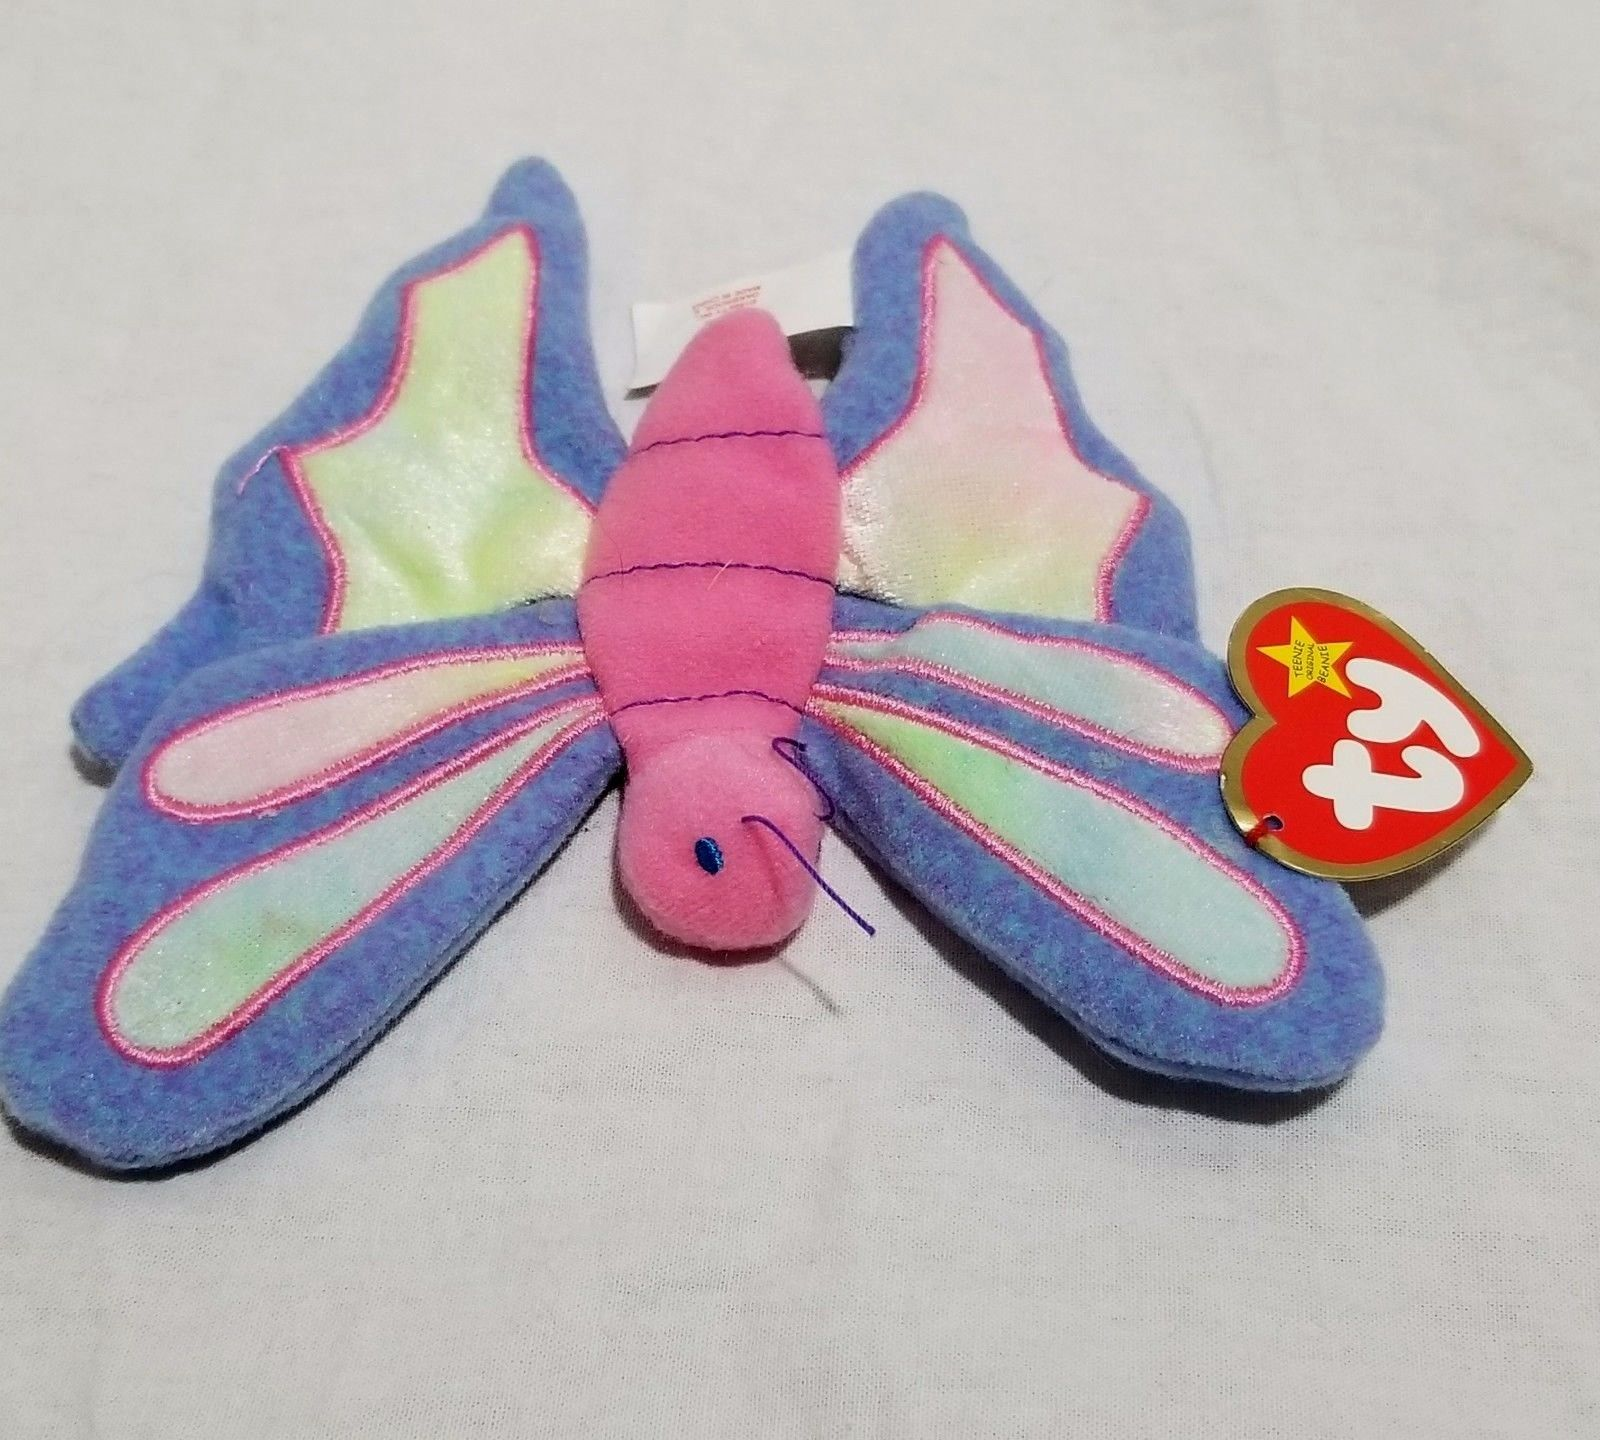 0baf8c49840 Flitter The Butterfly Ty Teenie Beanie Baby and 32 similar items. 57